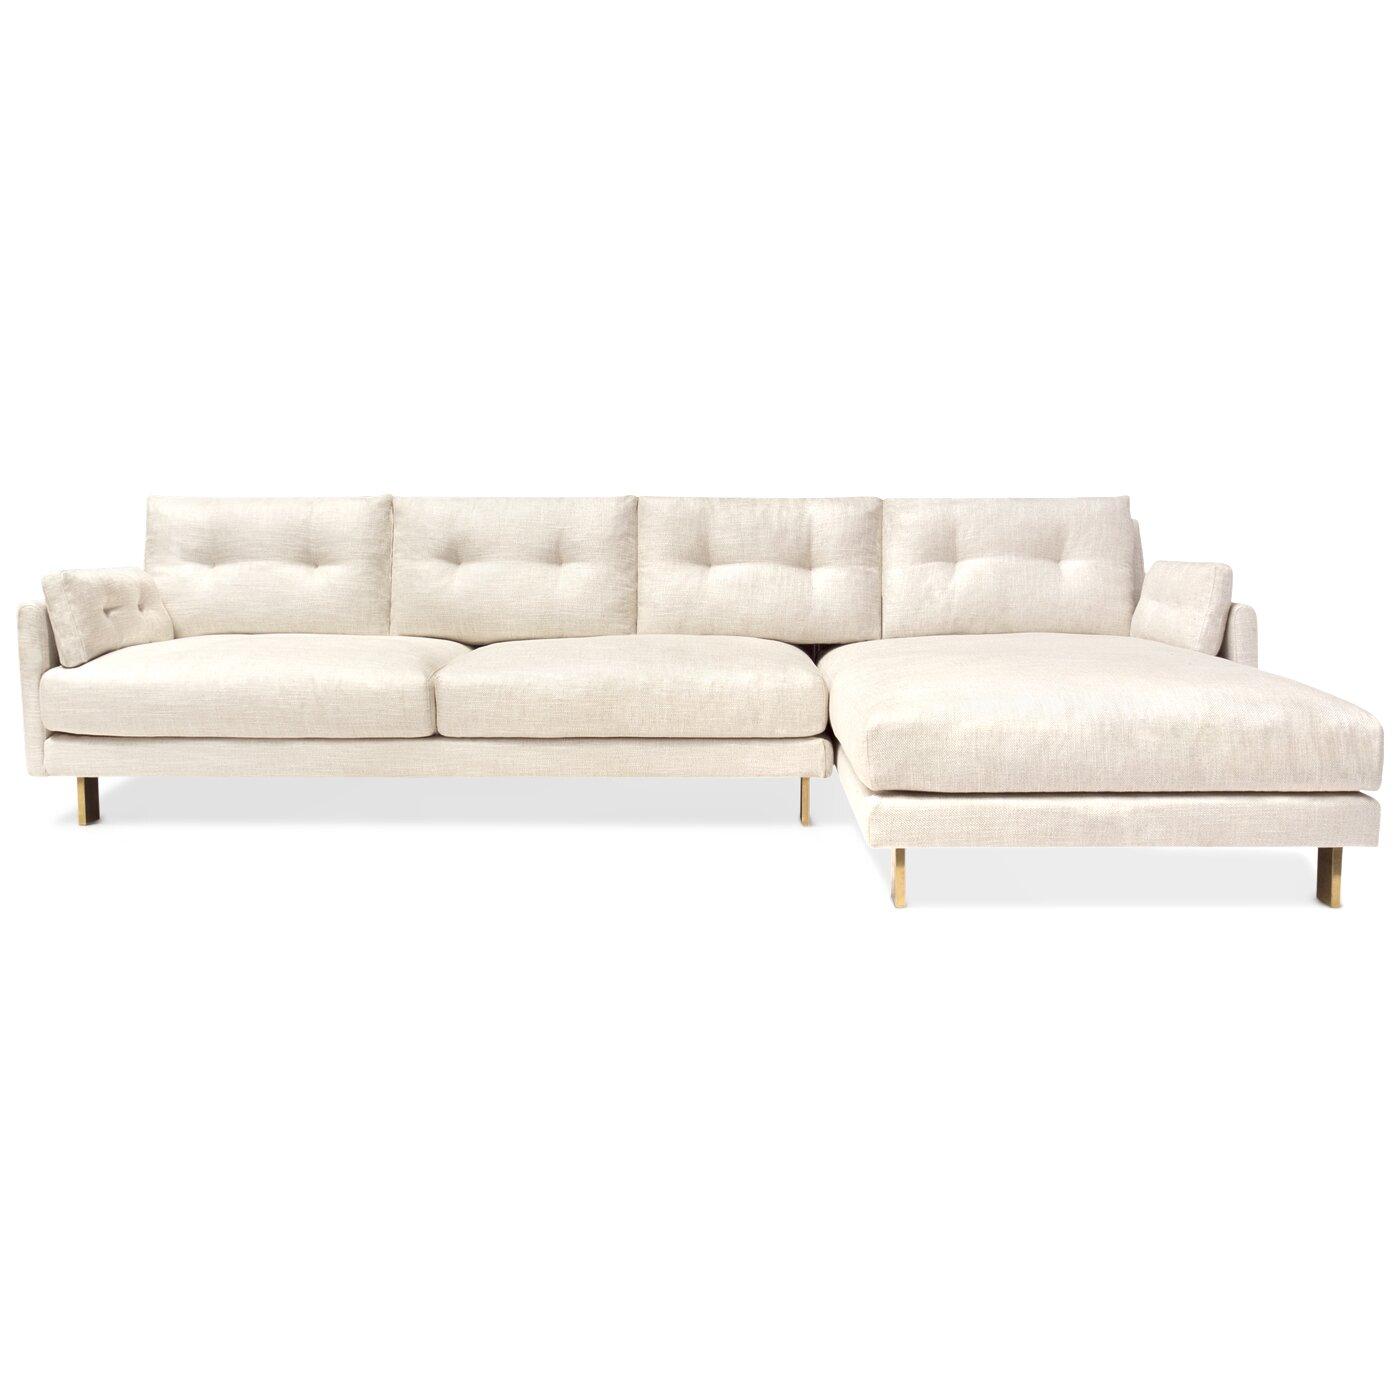 Sectional Sofa Sale Birmingham Al: Jonathan Adler Malibu Sectional